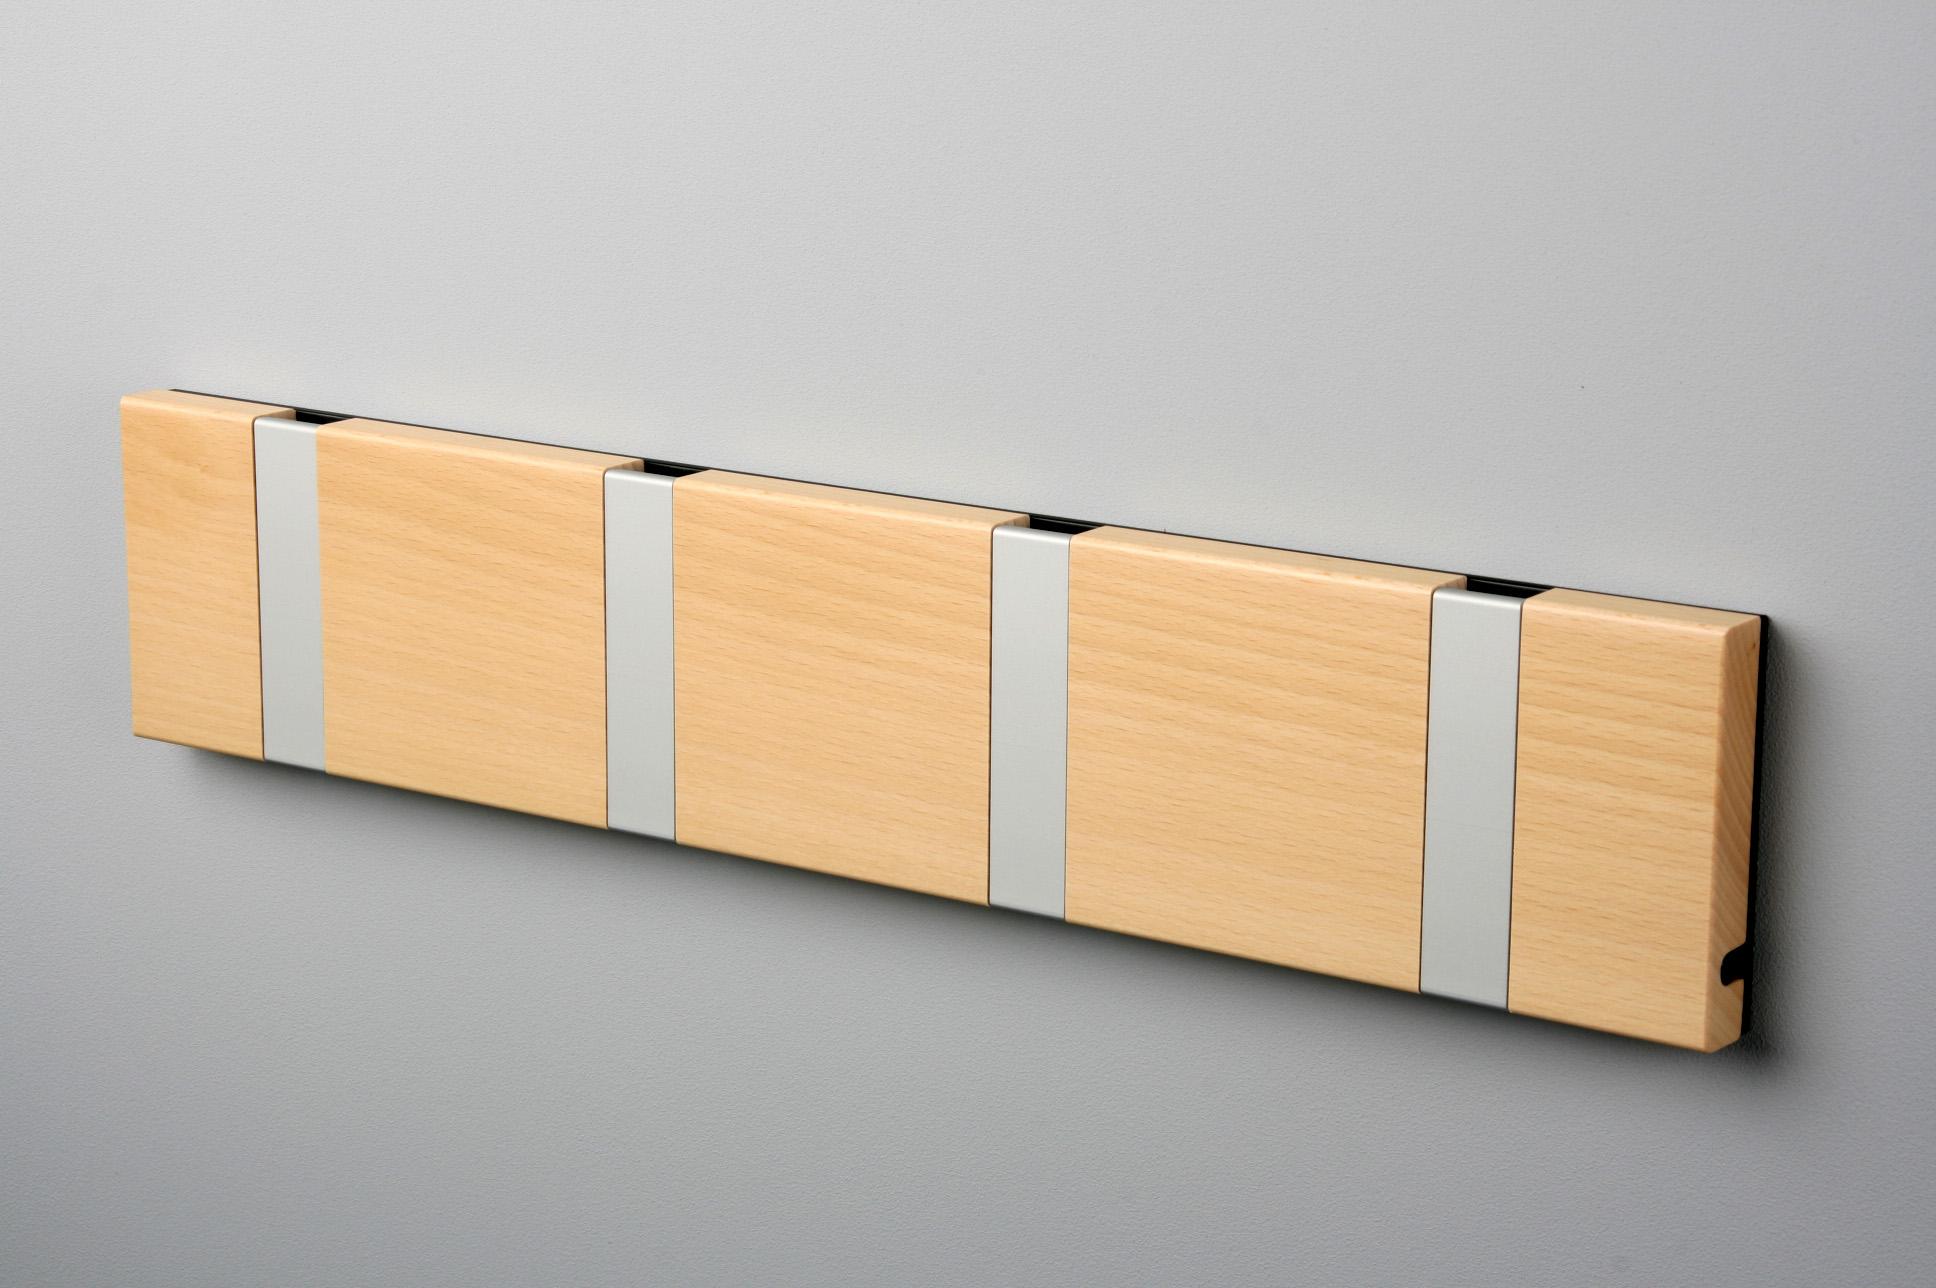 Design Coat Racks Nz - Tradingbasis